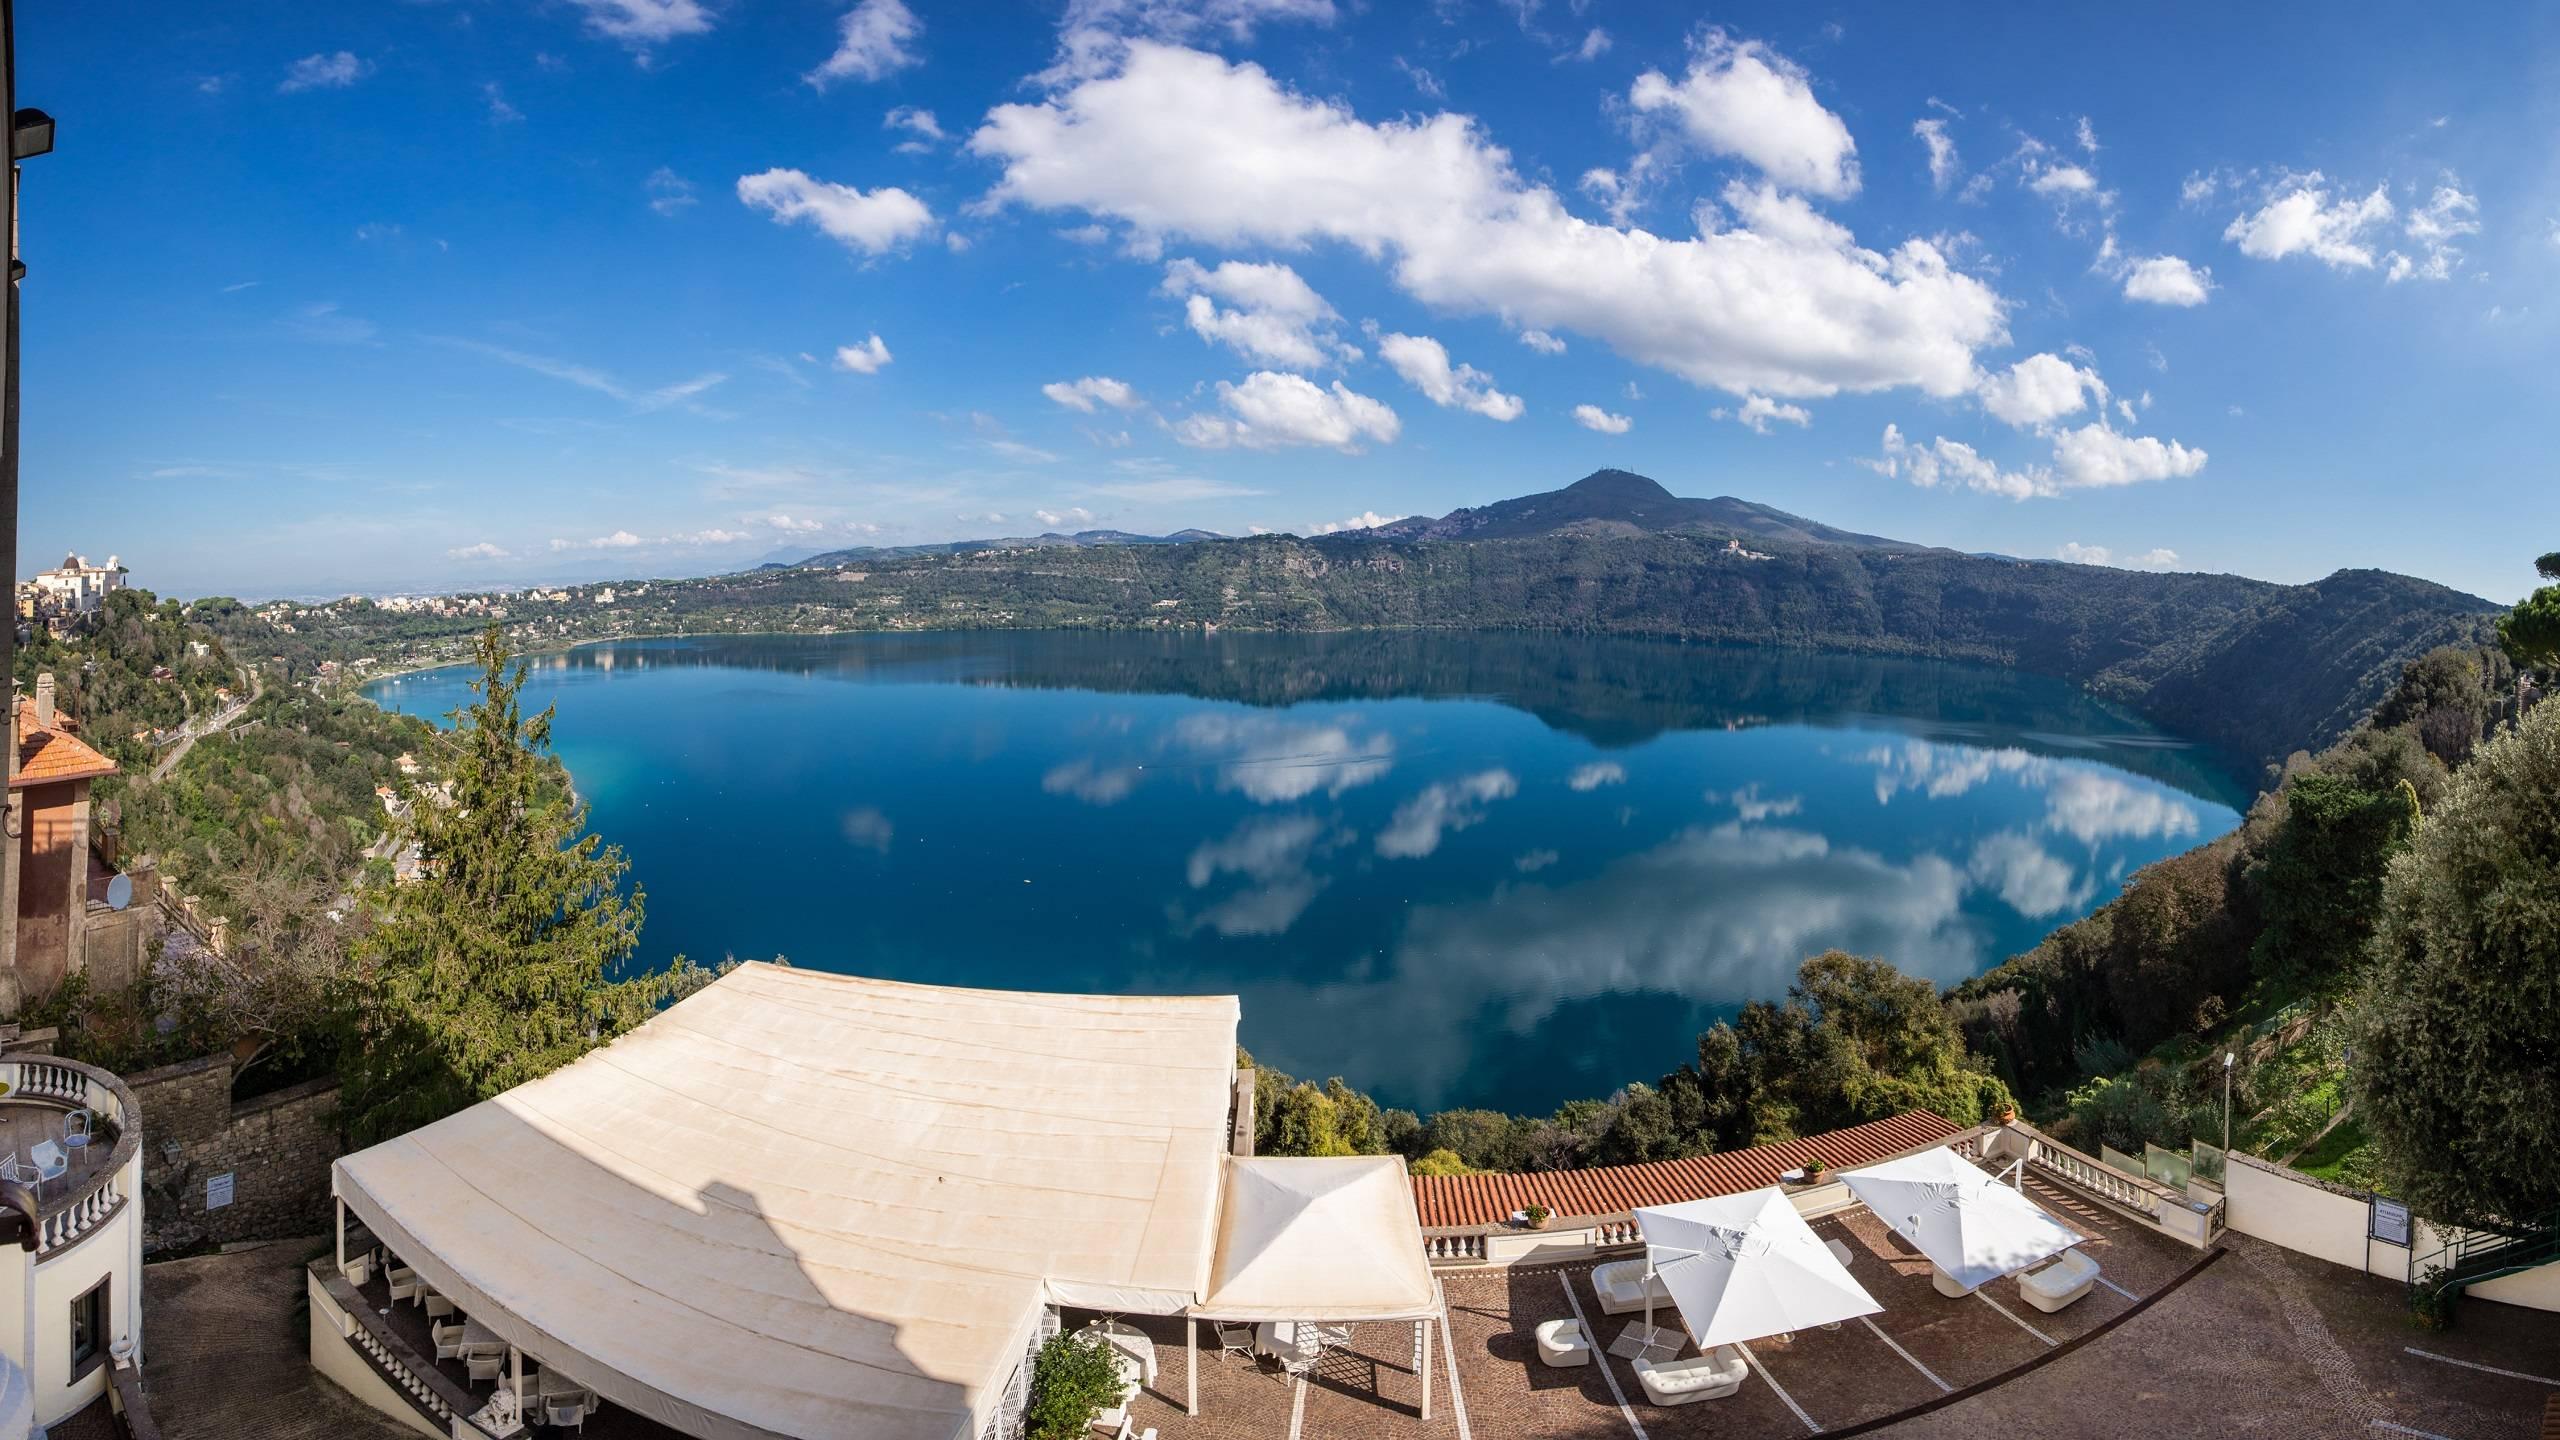 Hotel-Castel-Vecchio-Castel-Gandolfo-lake-evening-sunset-5770